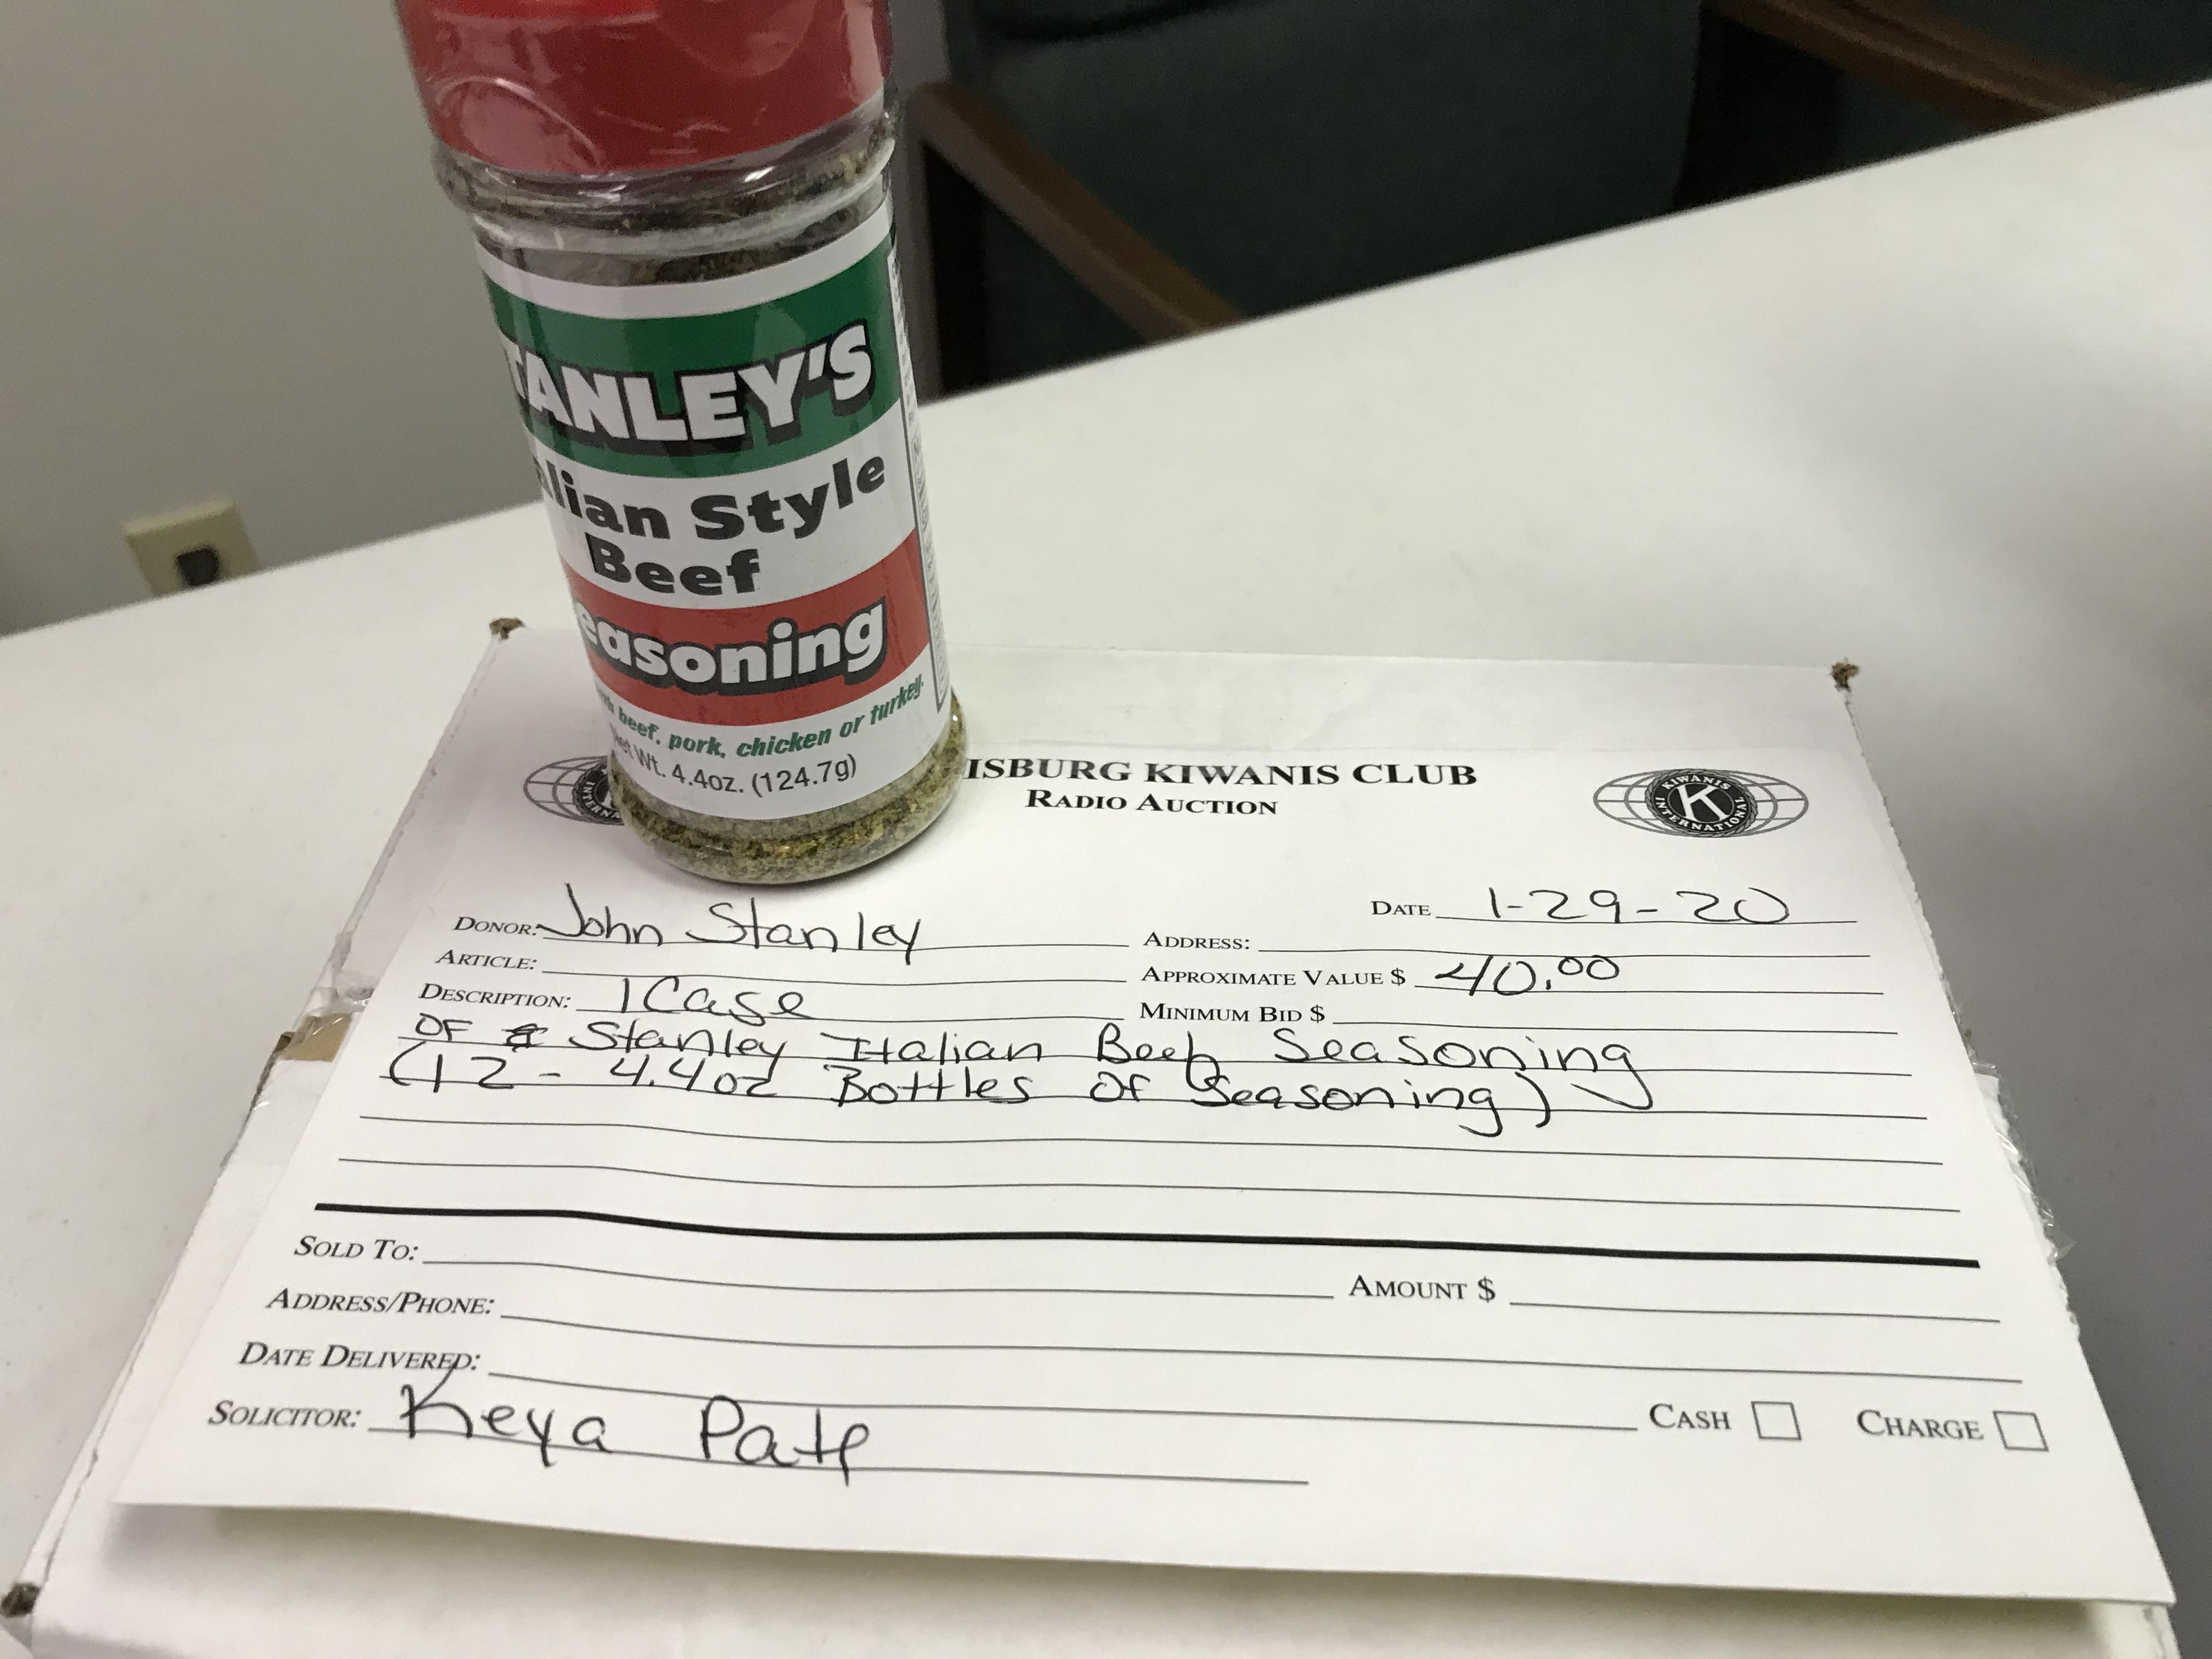 Item 418 - John Stanley 1 Case (12 4.4 oz Bottles) of Stanley's Italian Beef Seasoning